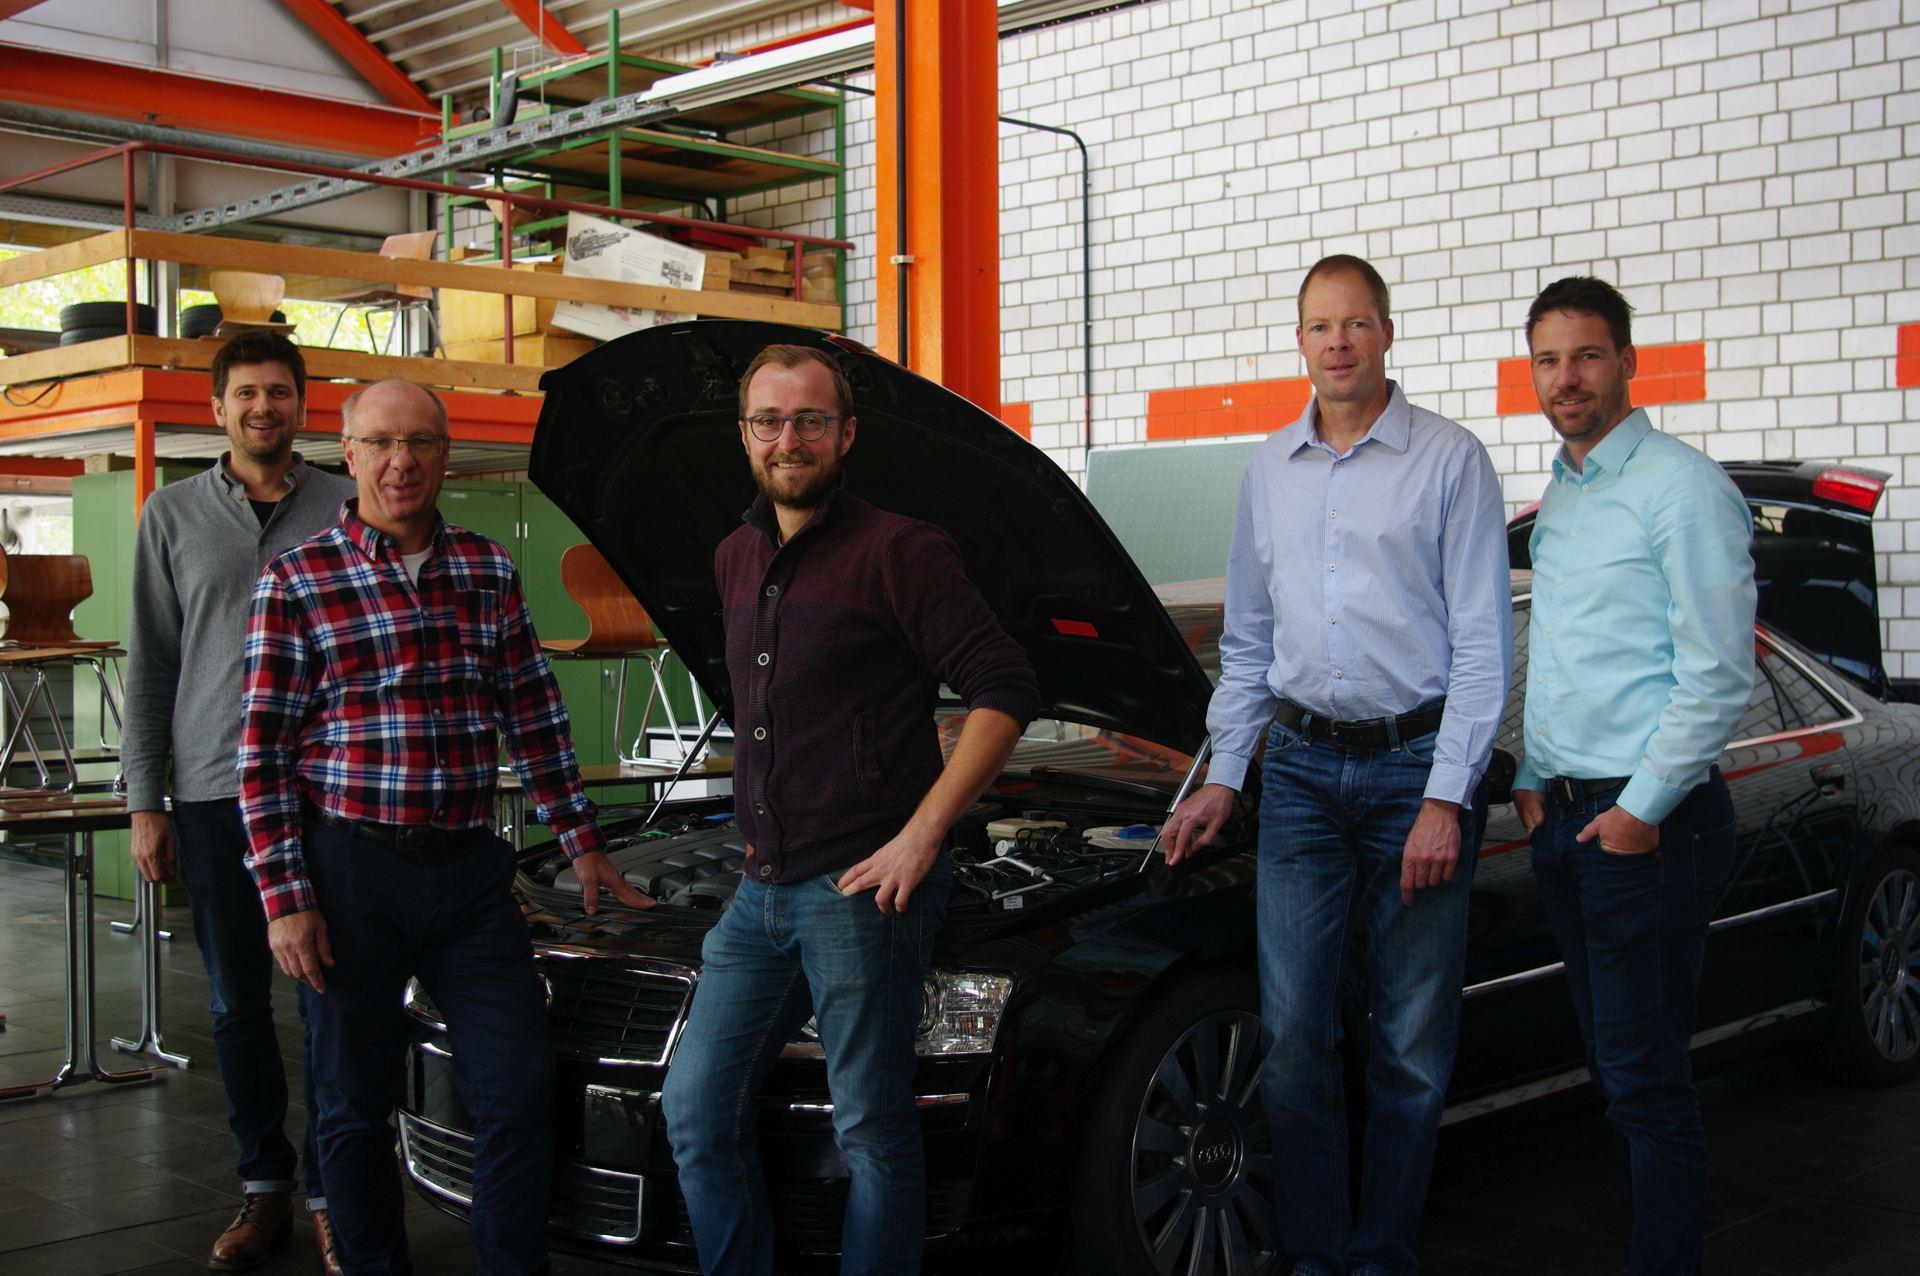 Abteilung Kraftfahrzeugtechnik - Leo Greier, Simon Manger, Gerald Makowski, Sebastian Werner, Rolf Hoffmann - von links nach rechts